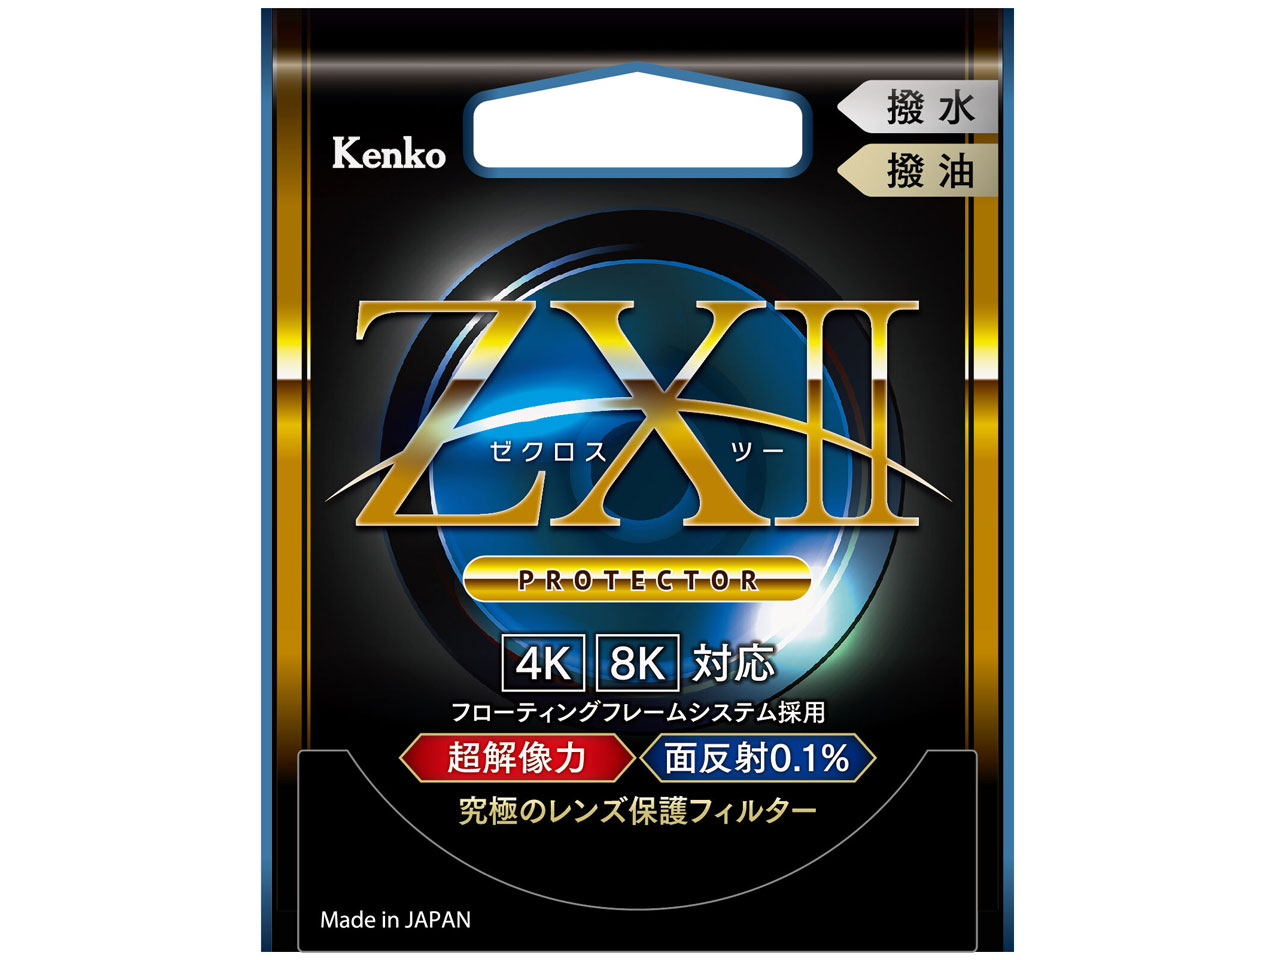 ZR01コート 採用で 面反射0.1%の超低反射を実現 新品 Kenko ZXII オンラインショップ プロテクター 日本製 トキナー 86mm メール便 代引き不可 ケンコー 送料無料